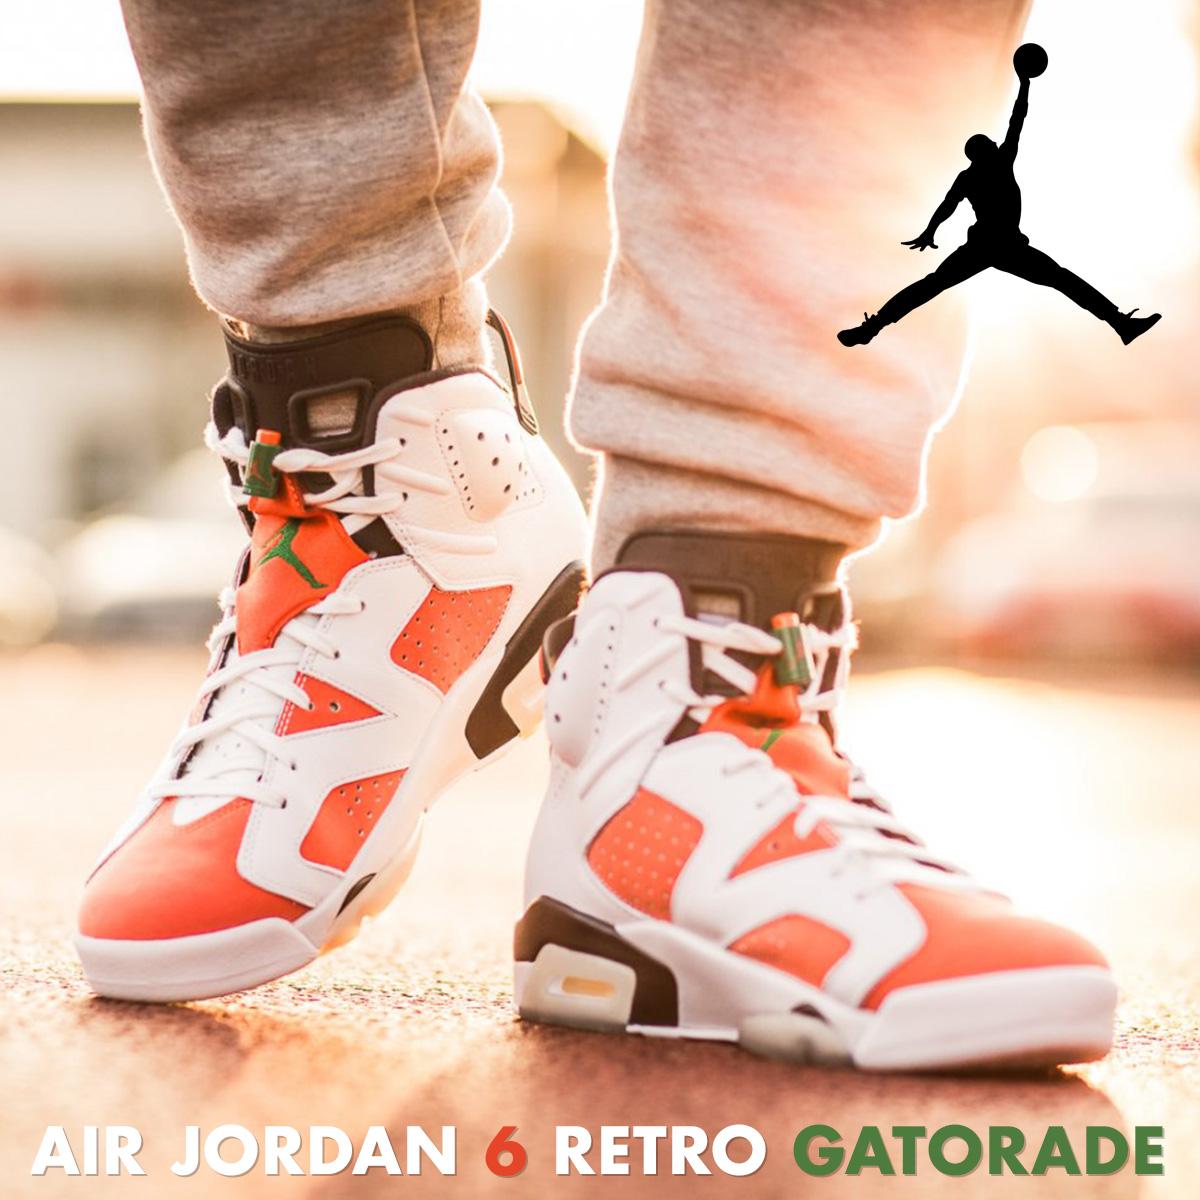 big sale 877b5 3a6a8 NIKE AIR JORDAN 6 RETRO GATORADE Nike Air Jordan 6 nostalgic sneakers  384,664-145 men s white  load planned Shinnyu load in reservation product  1 26 ...